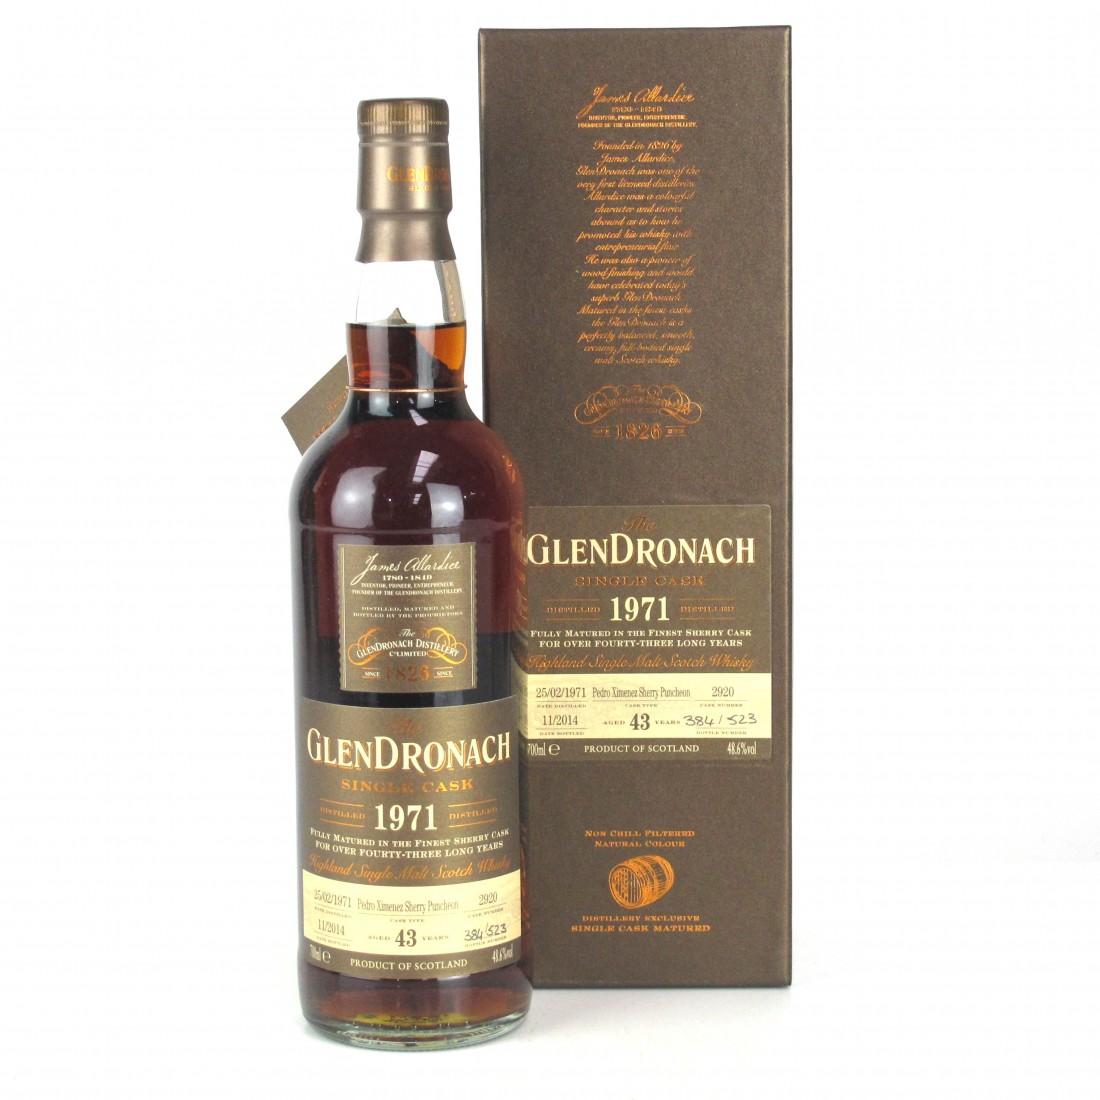 Glendronach 1971 Single Cask 43 Year Old #2920